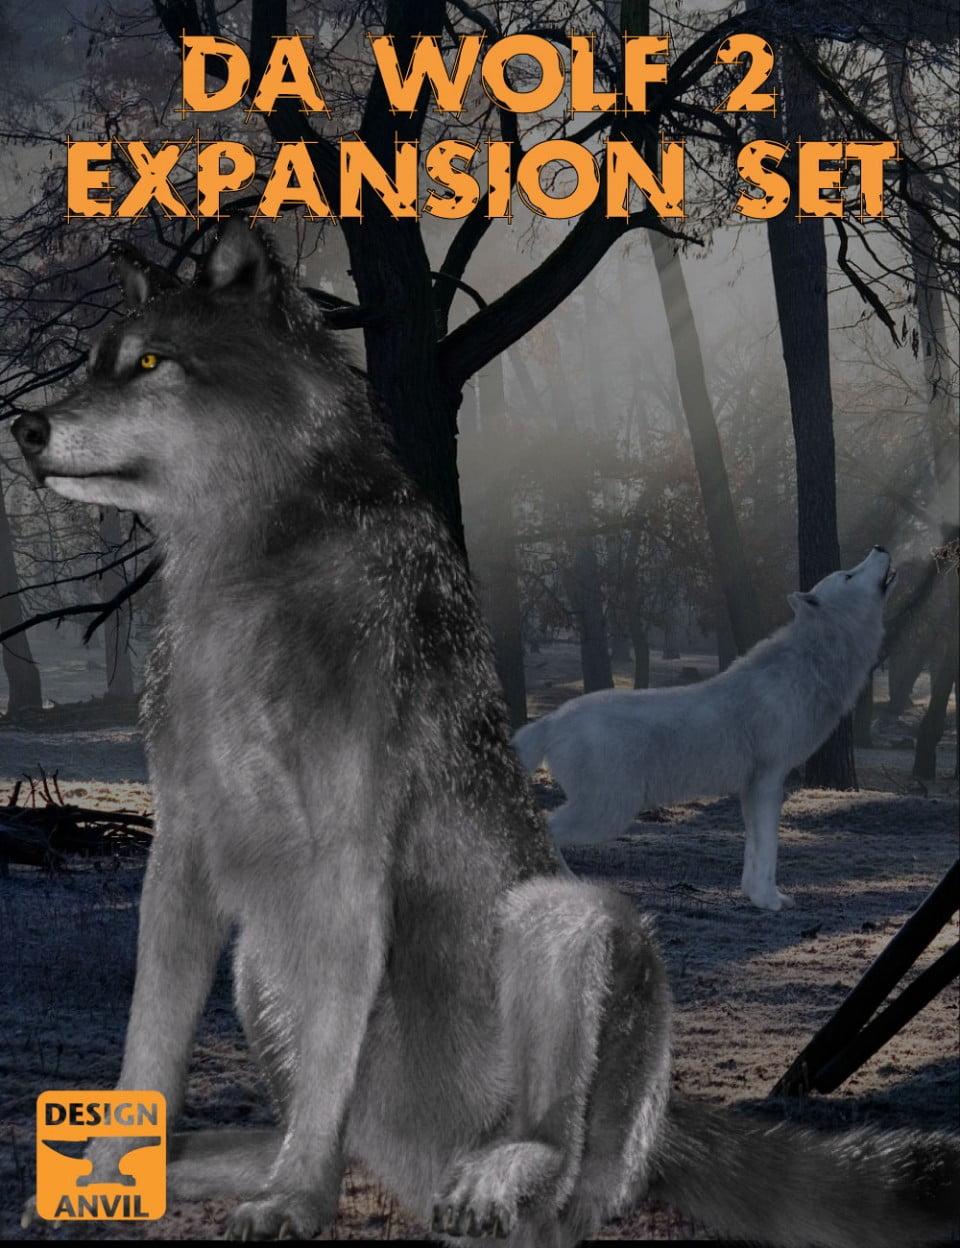 DA Wolf 2 Expansion Set